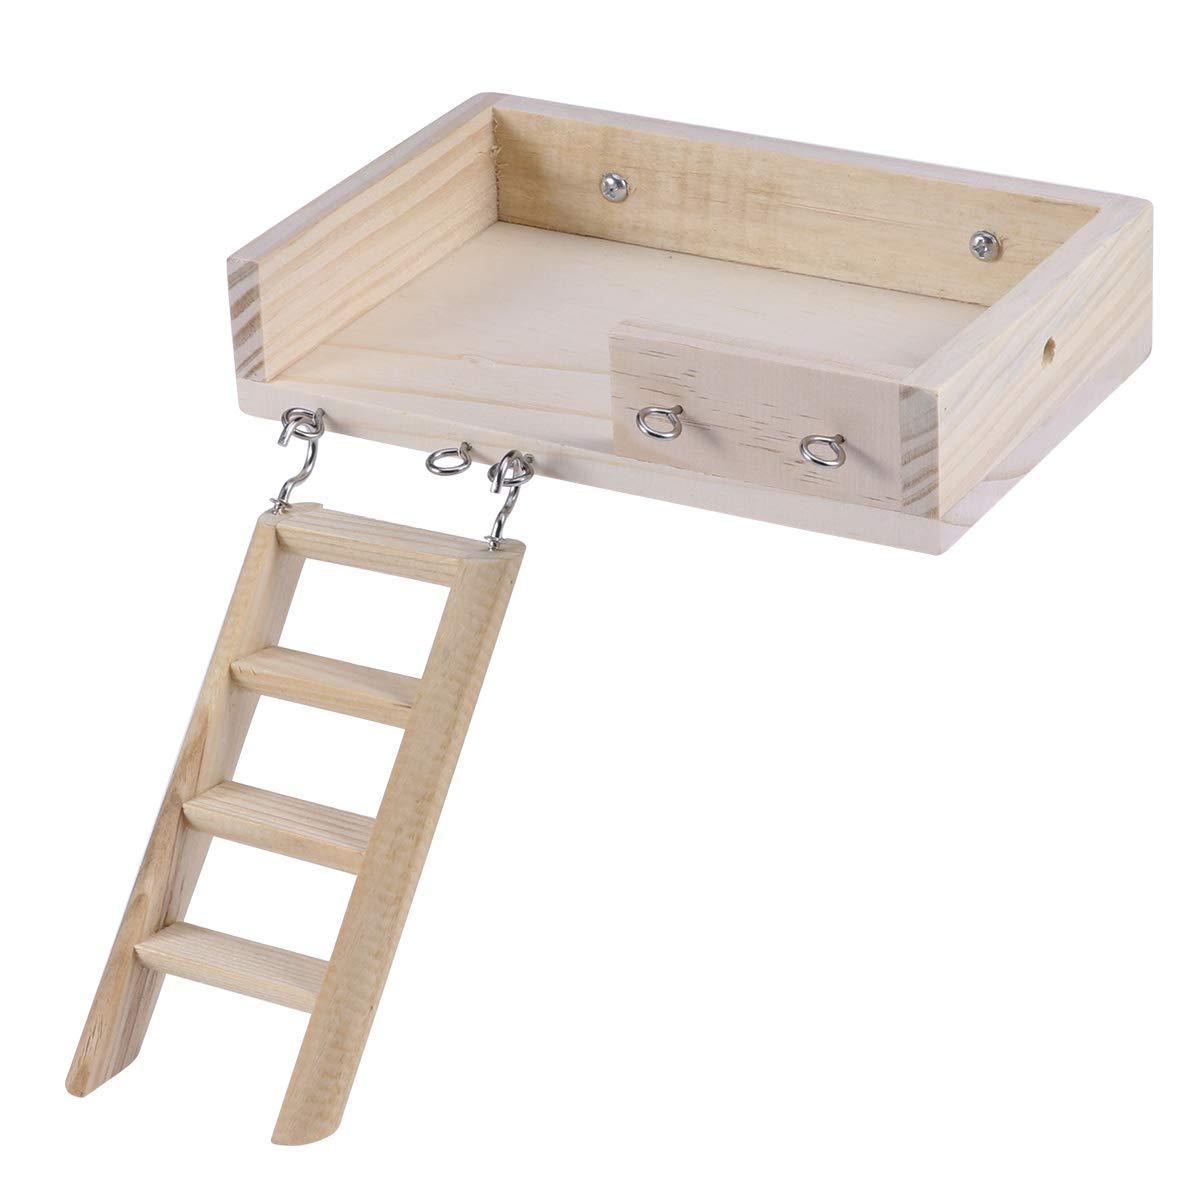 POPETPOP Hamster Platform Toy Hamster Crawling Ladder Hamster Toy Set for Small Pet (Ladder + Platform) 2Pcs by POPETPOP